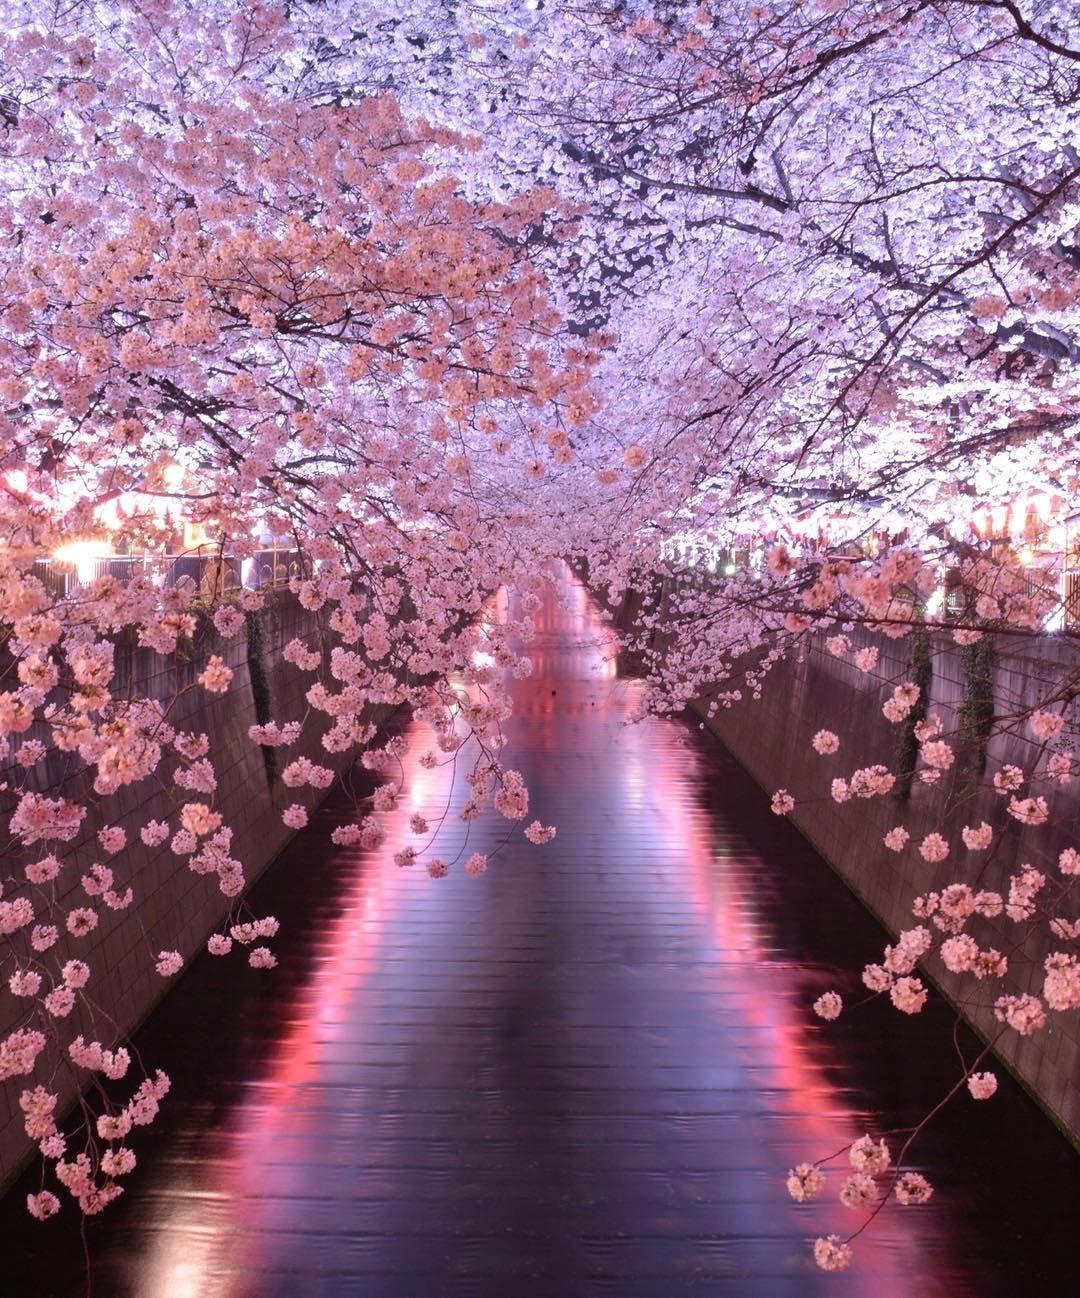 Meguro River Japan Tokyo Wisteria Tree Tree Tunnel Pink Flowering Trees